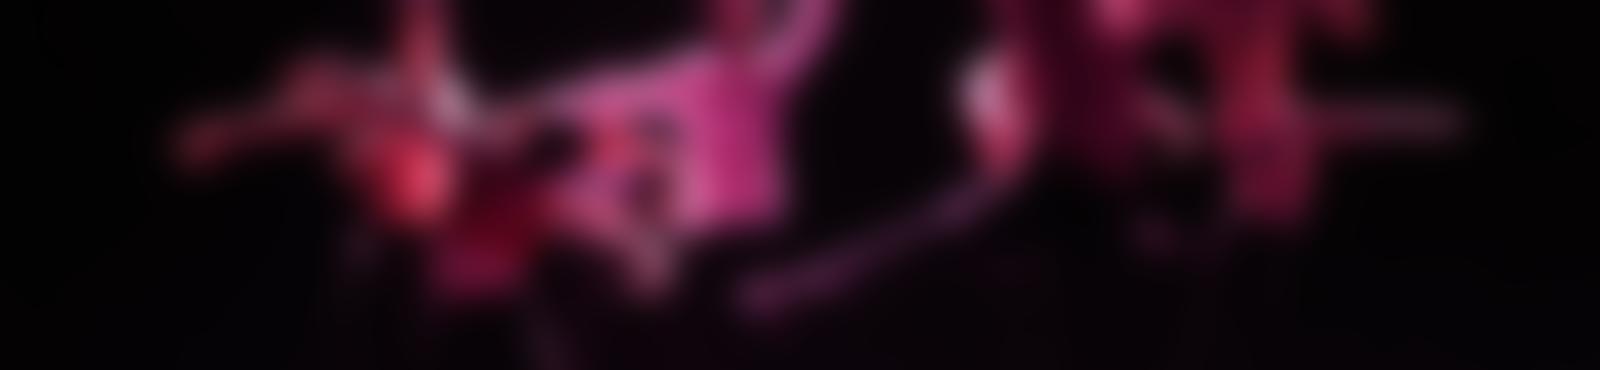 Blurred 53801524 60eb 4a19 ac6e 8d00d36b913b